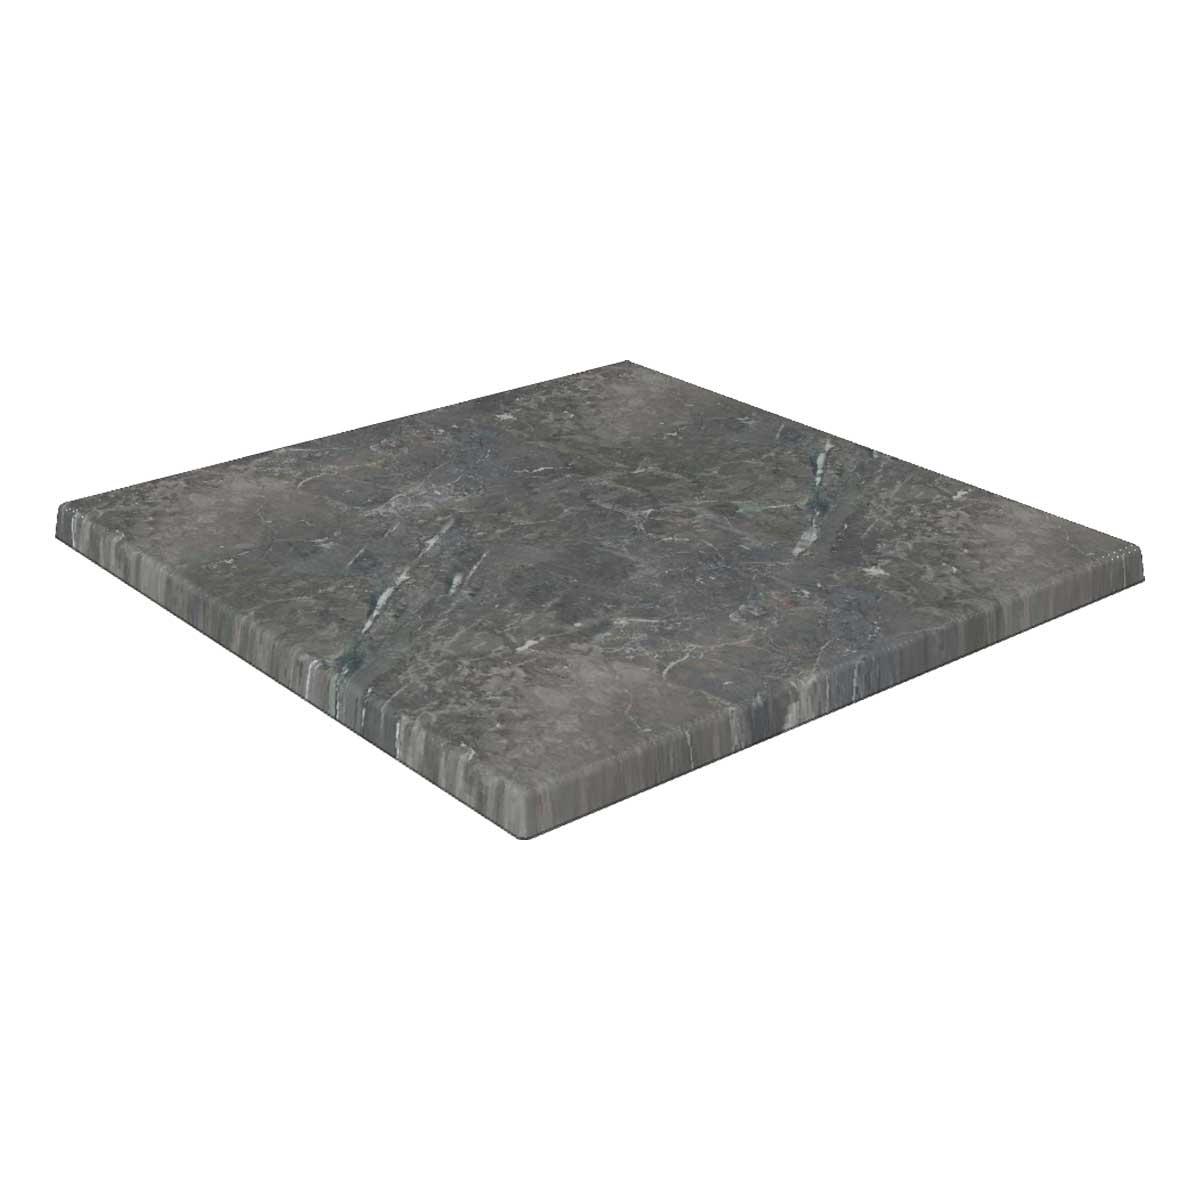 TICLA Q70 144 - https://www.werzalit.com/nl/product/tafelblad-classic-werzalit-q-80x80-144-marmor-sizilien/